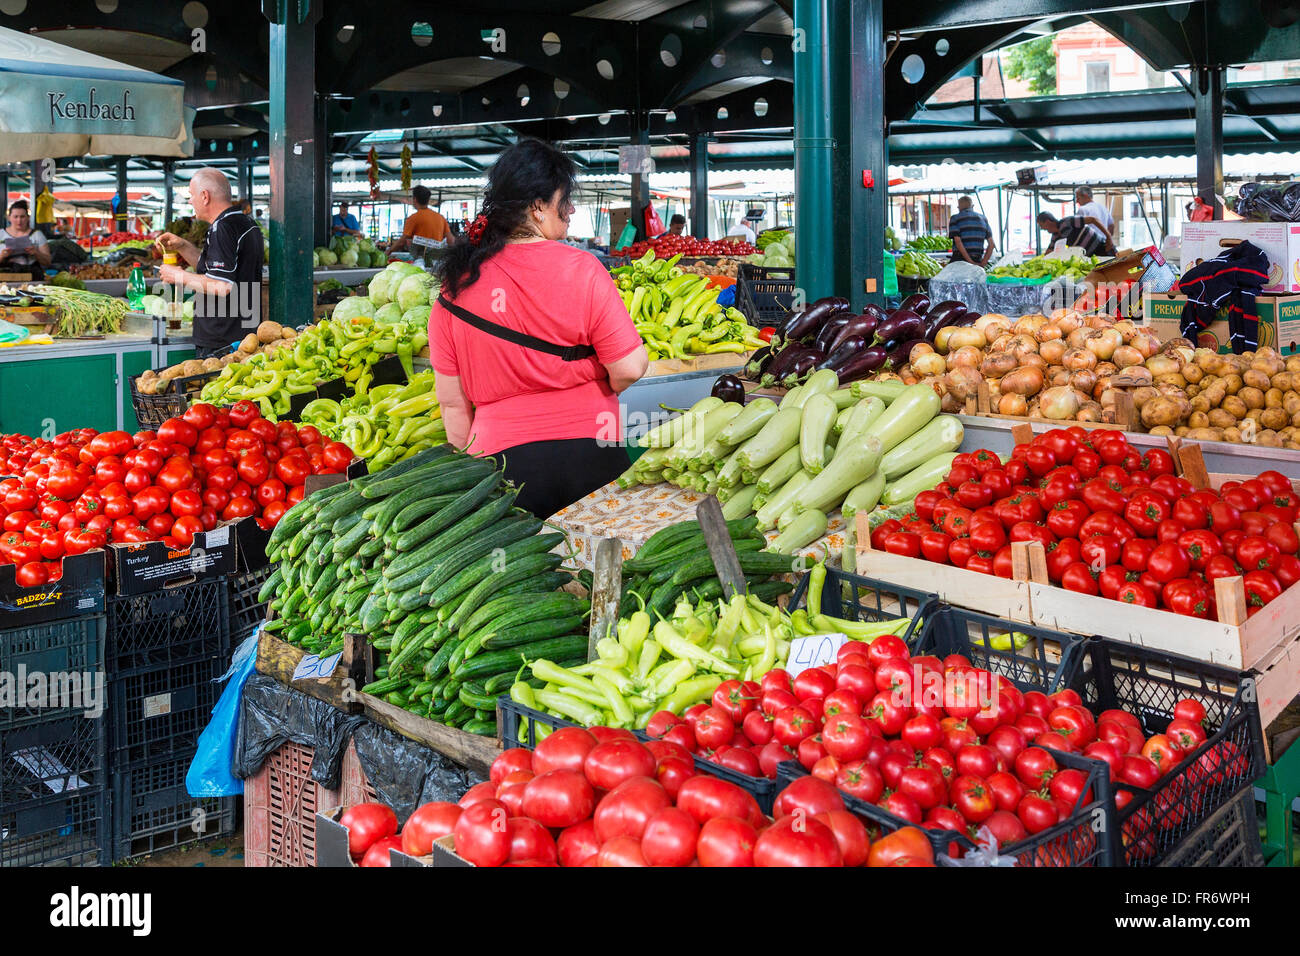 Republic of Macedonia, Bitola, the city center, the Old Bazaar - Stock Image